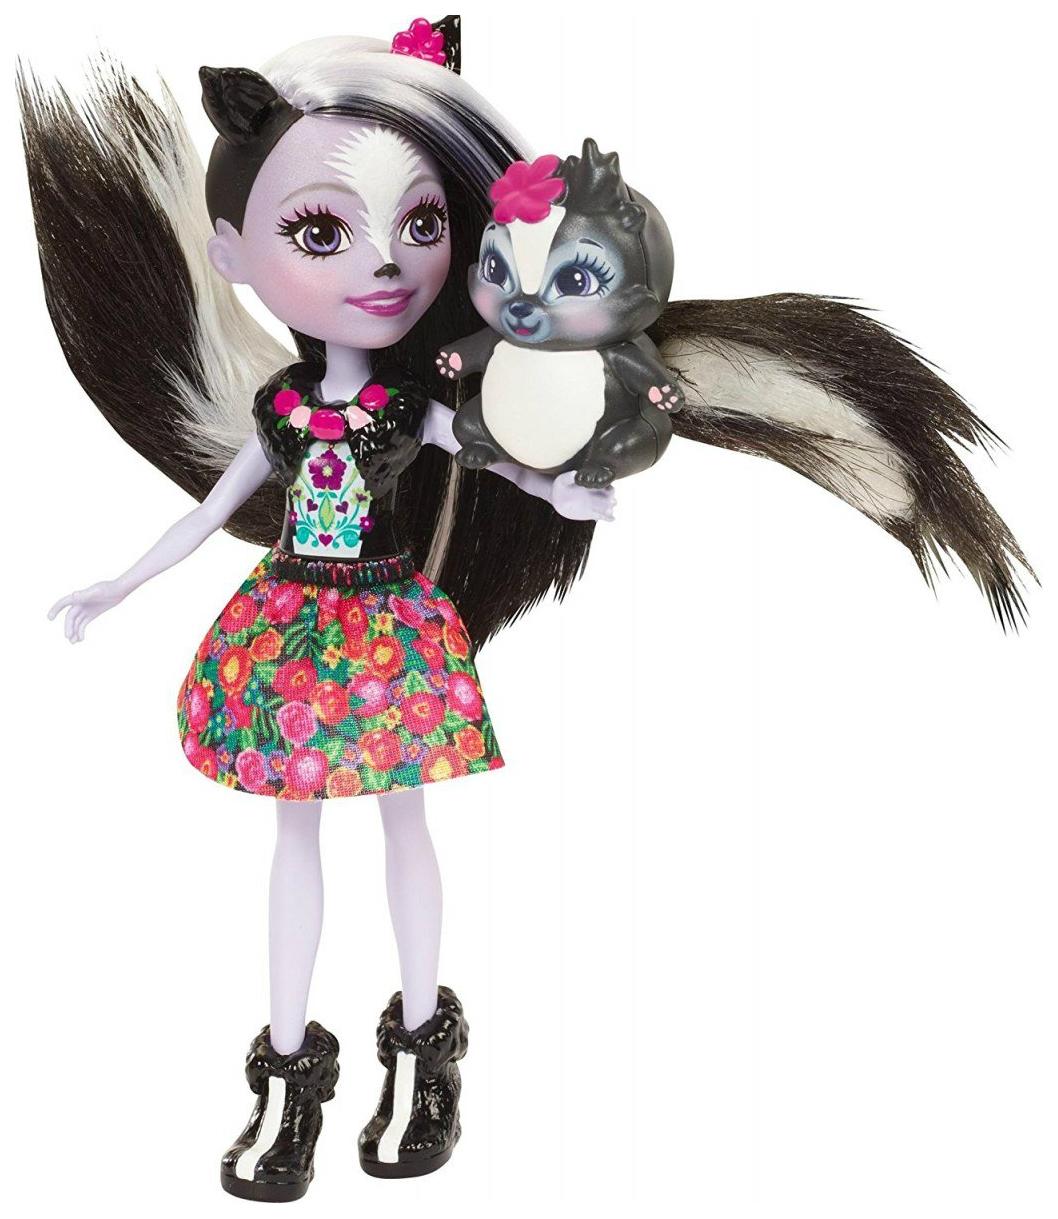 Коллекционная кукла Enchantimals сейдж скунси и Кейпер